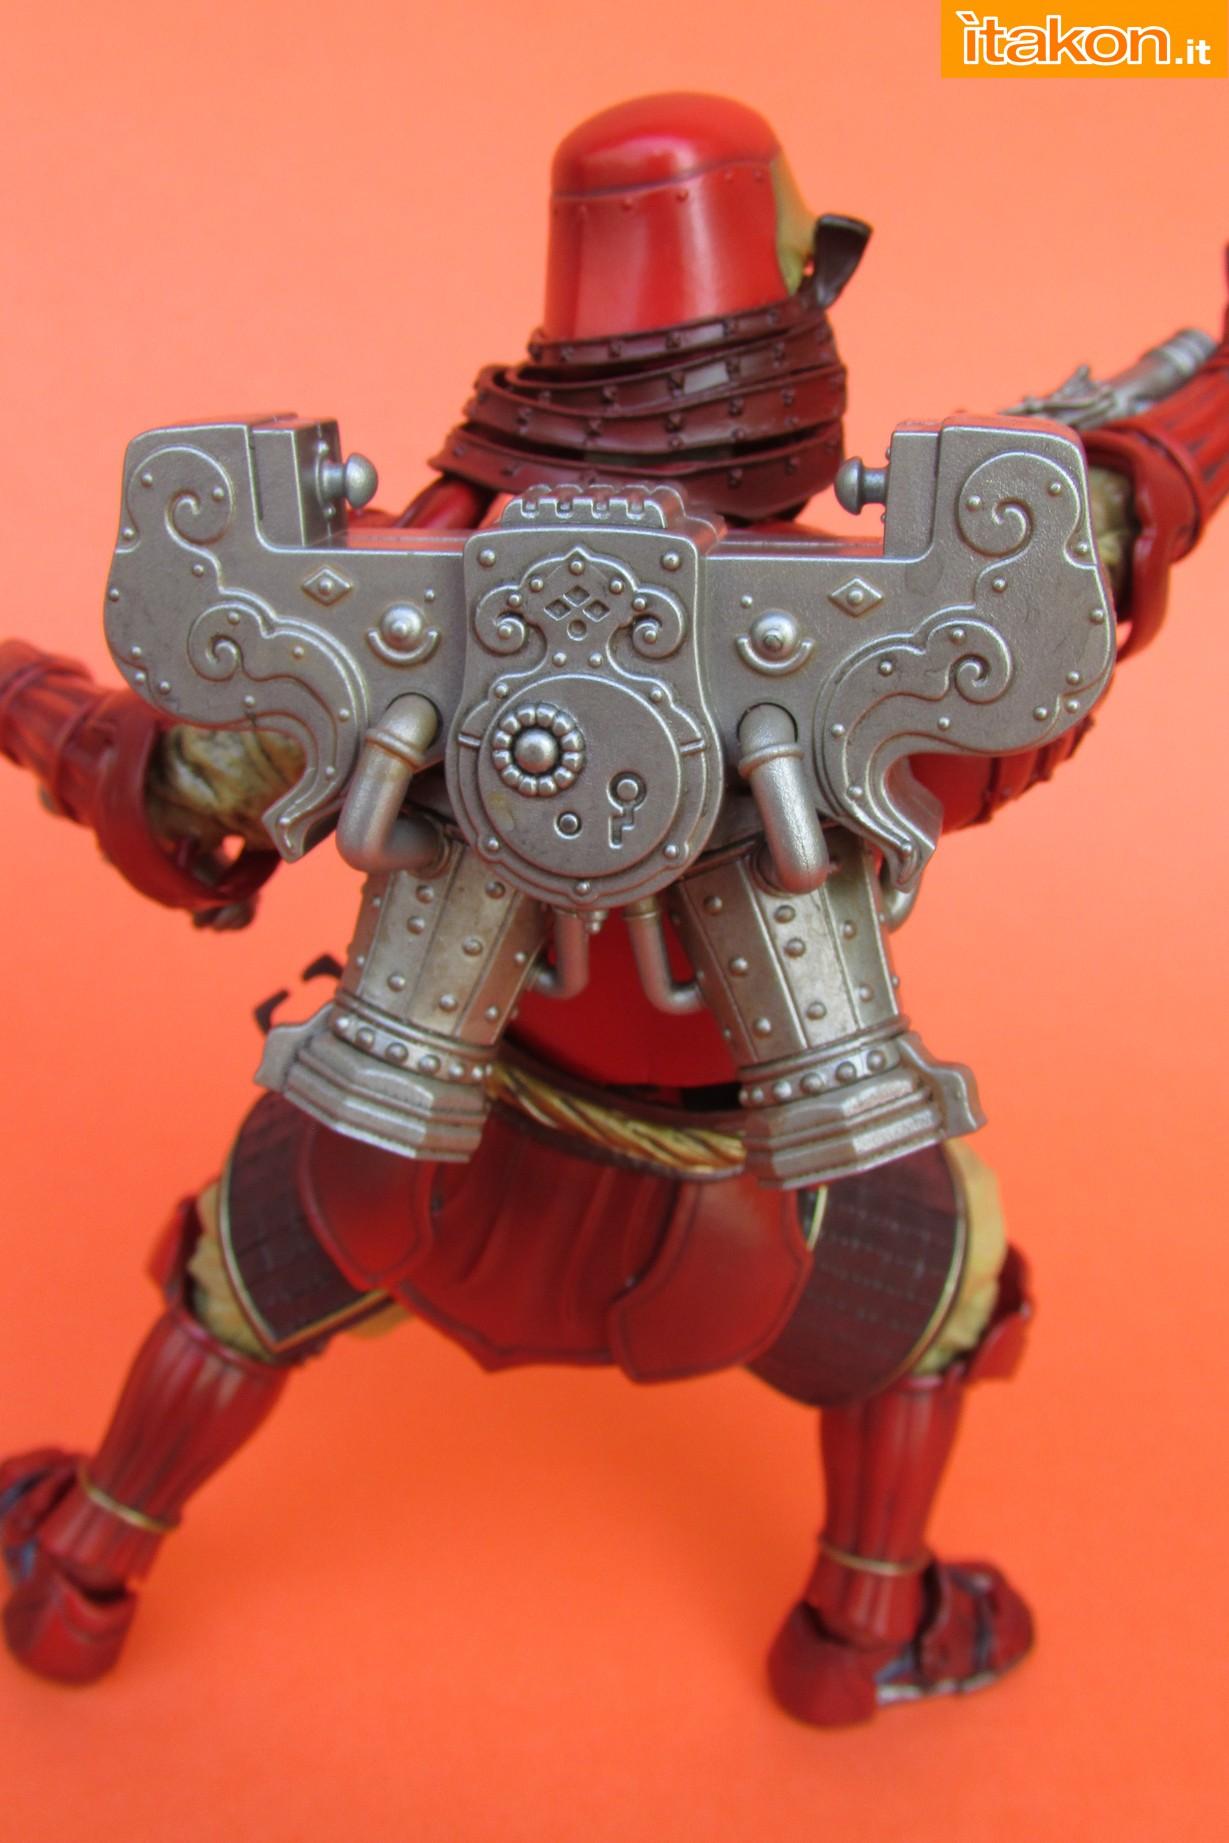 Link a Marvel Comics Koutetsu Samurai Iron Man Mark 3 Meishou MANGA REALIZATION review Bandai Itakon.it40